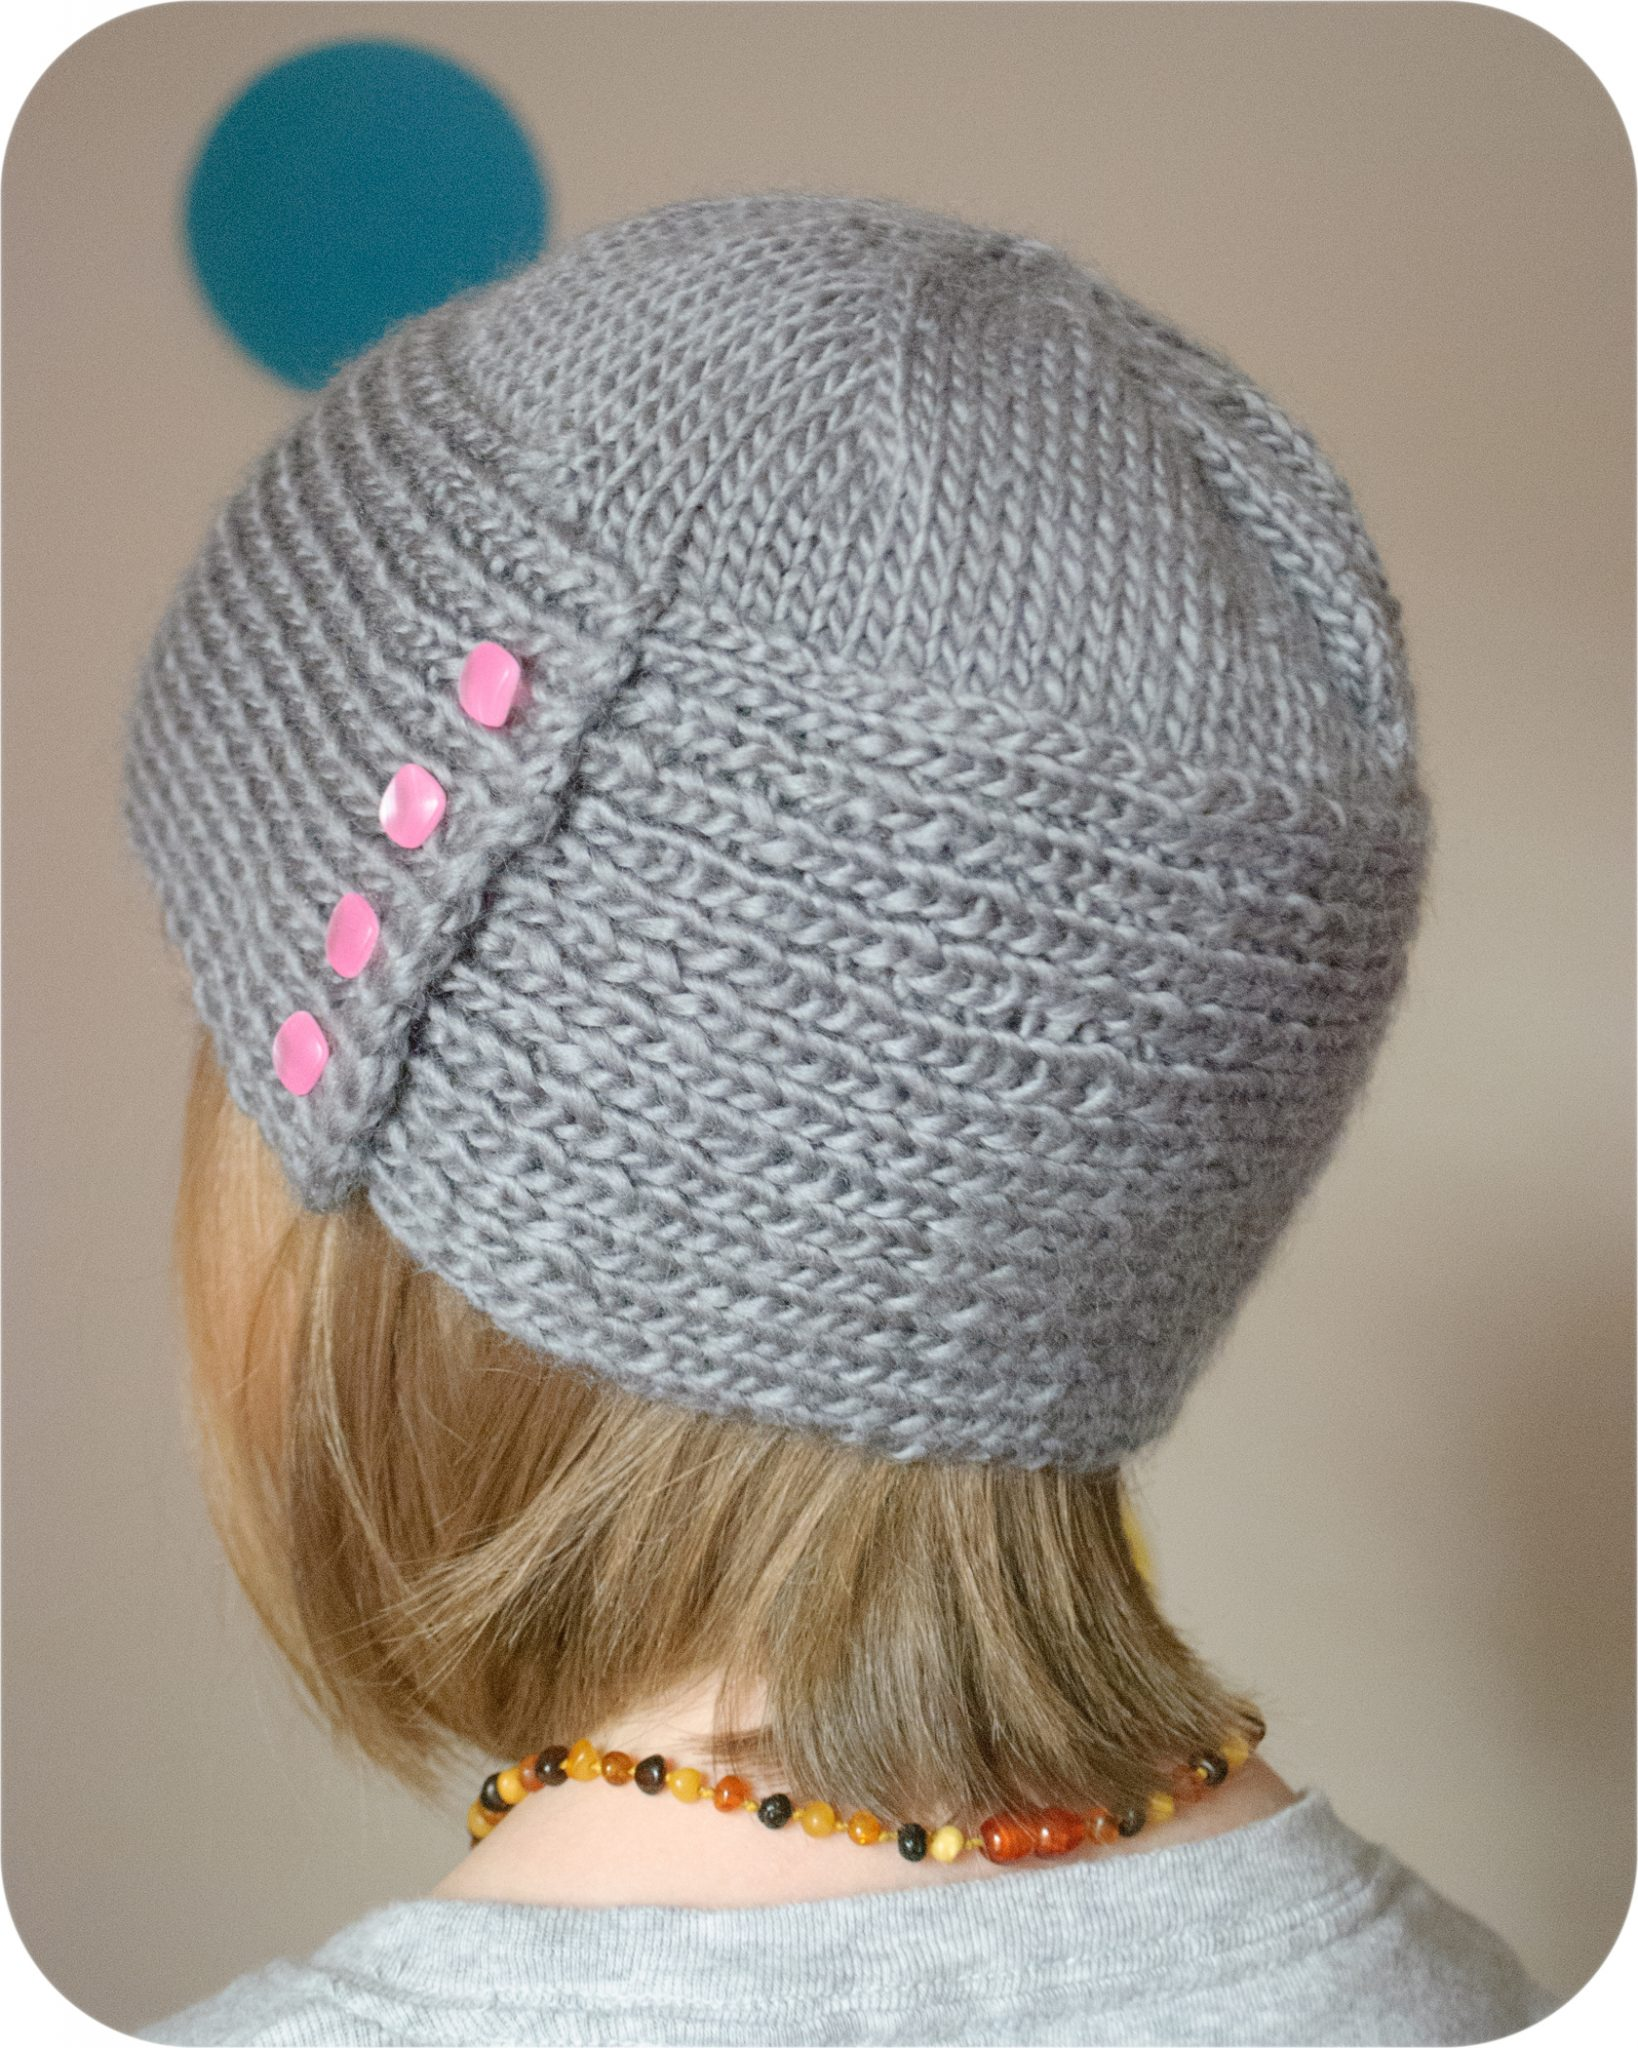 Monster Hat Knitting Pattern : The Woudman Hat PDF Knitting Pattern   The Eli Monster